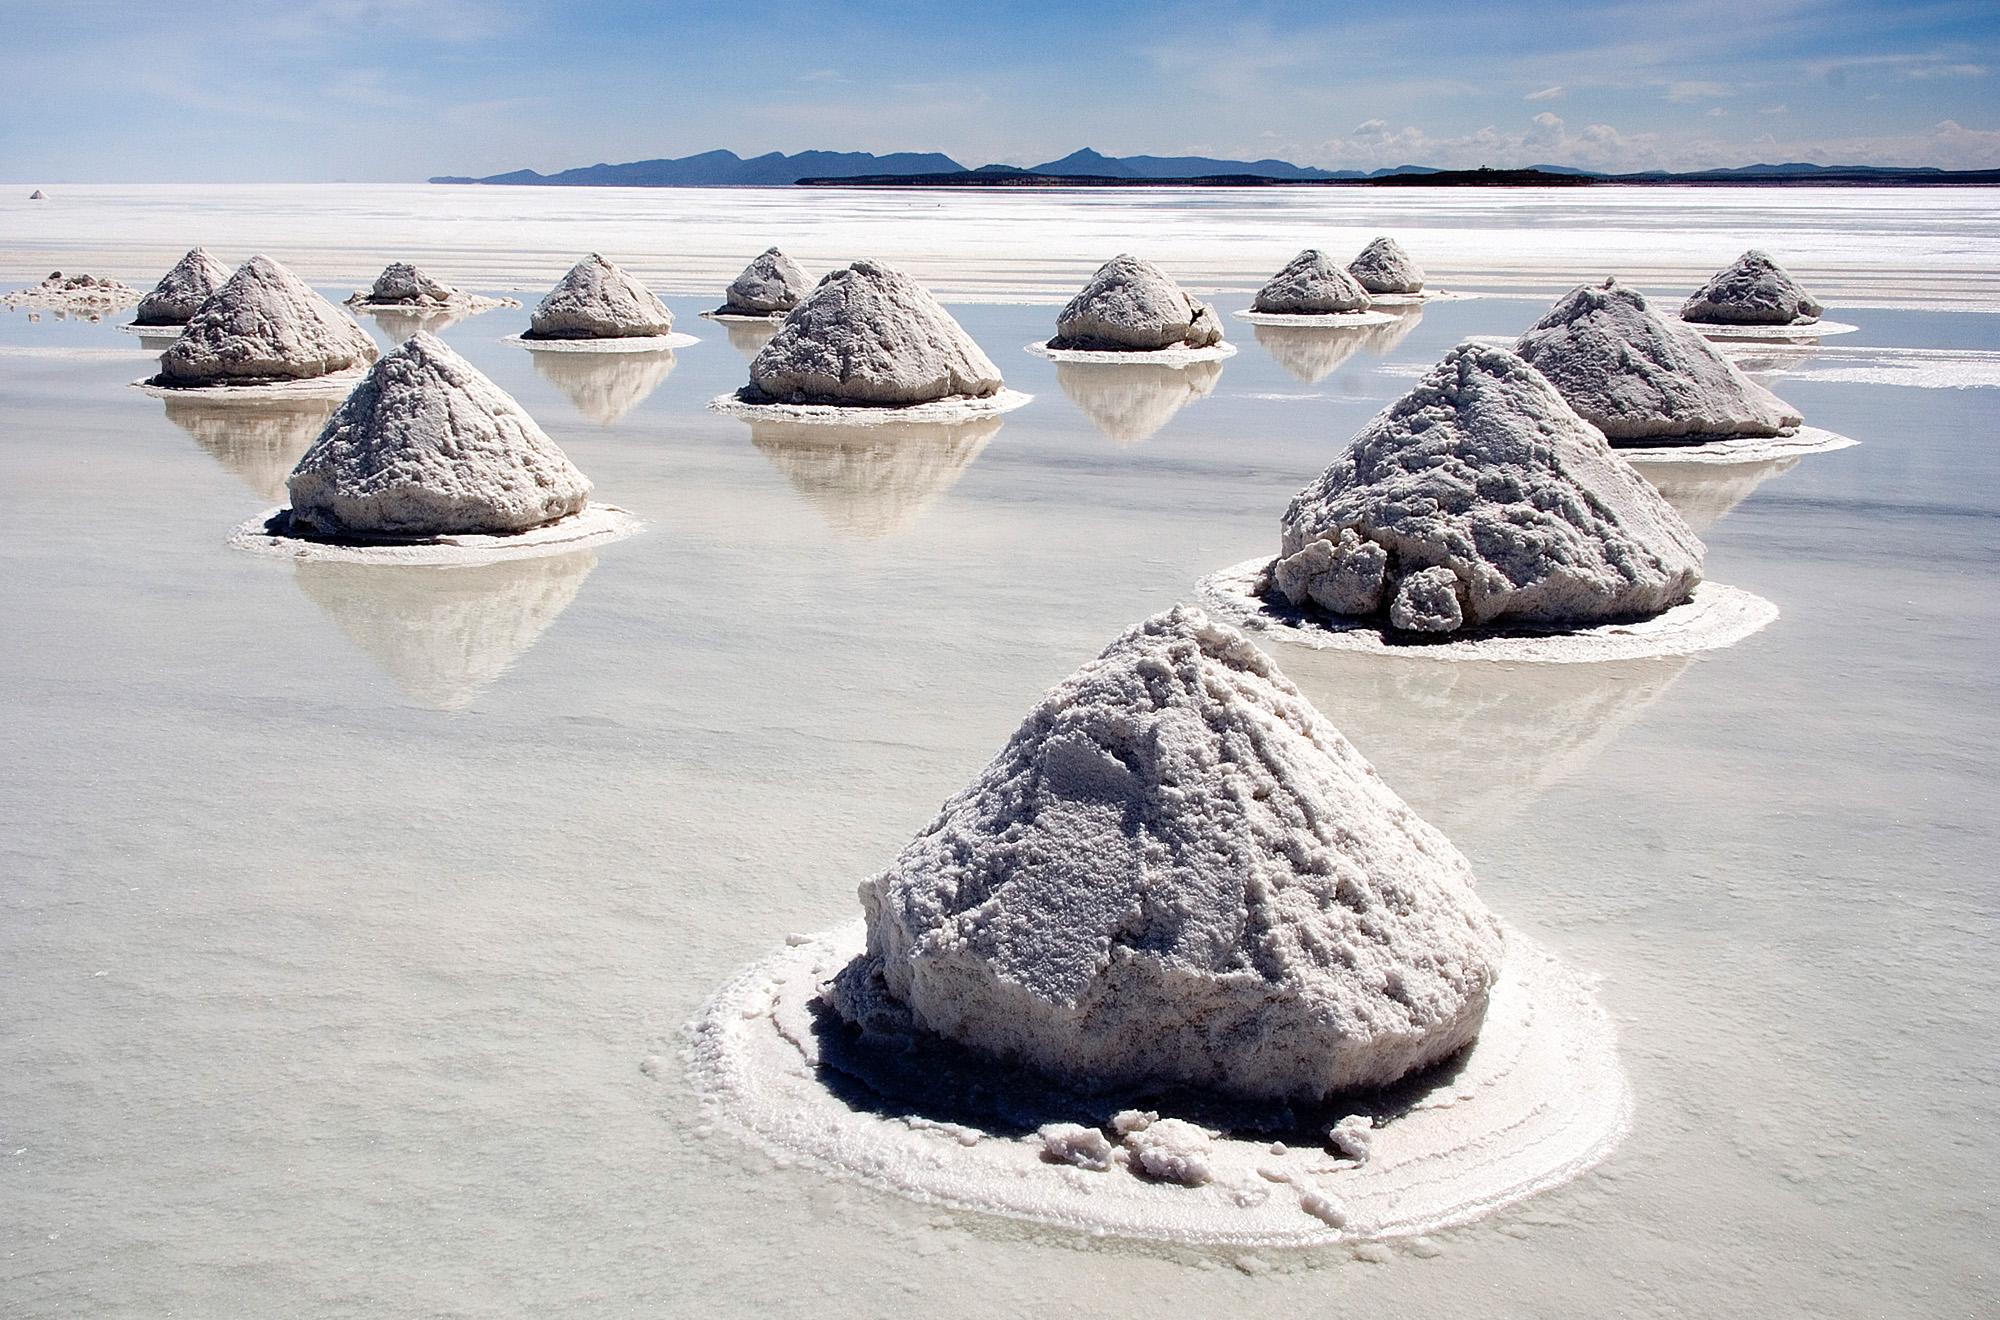 Piles_of_Salt_Salar_de_Uyuni_Bolivia_Luca_Galuzzi_2006_a.jpg